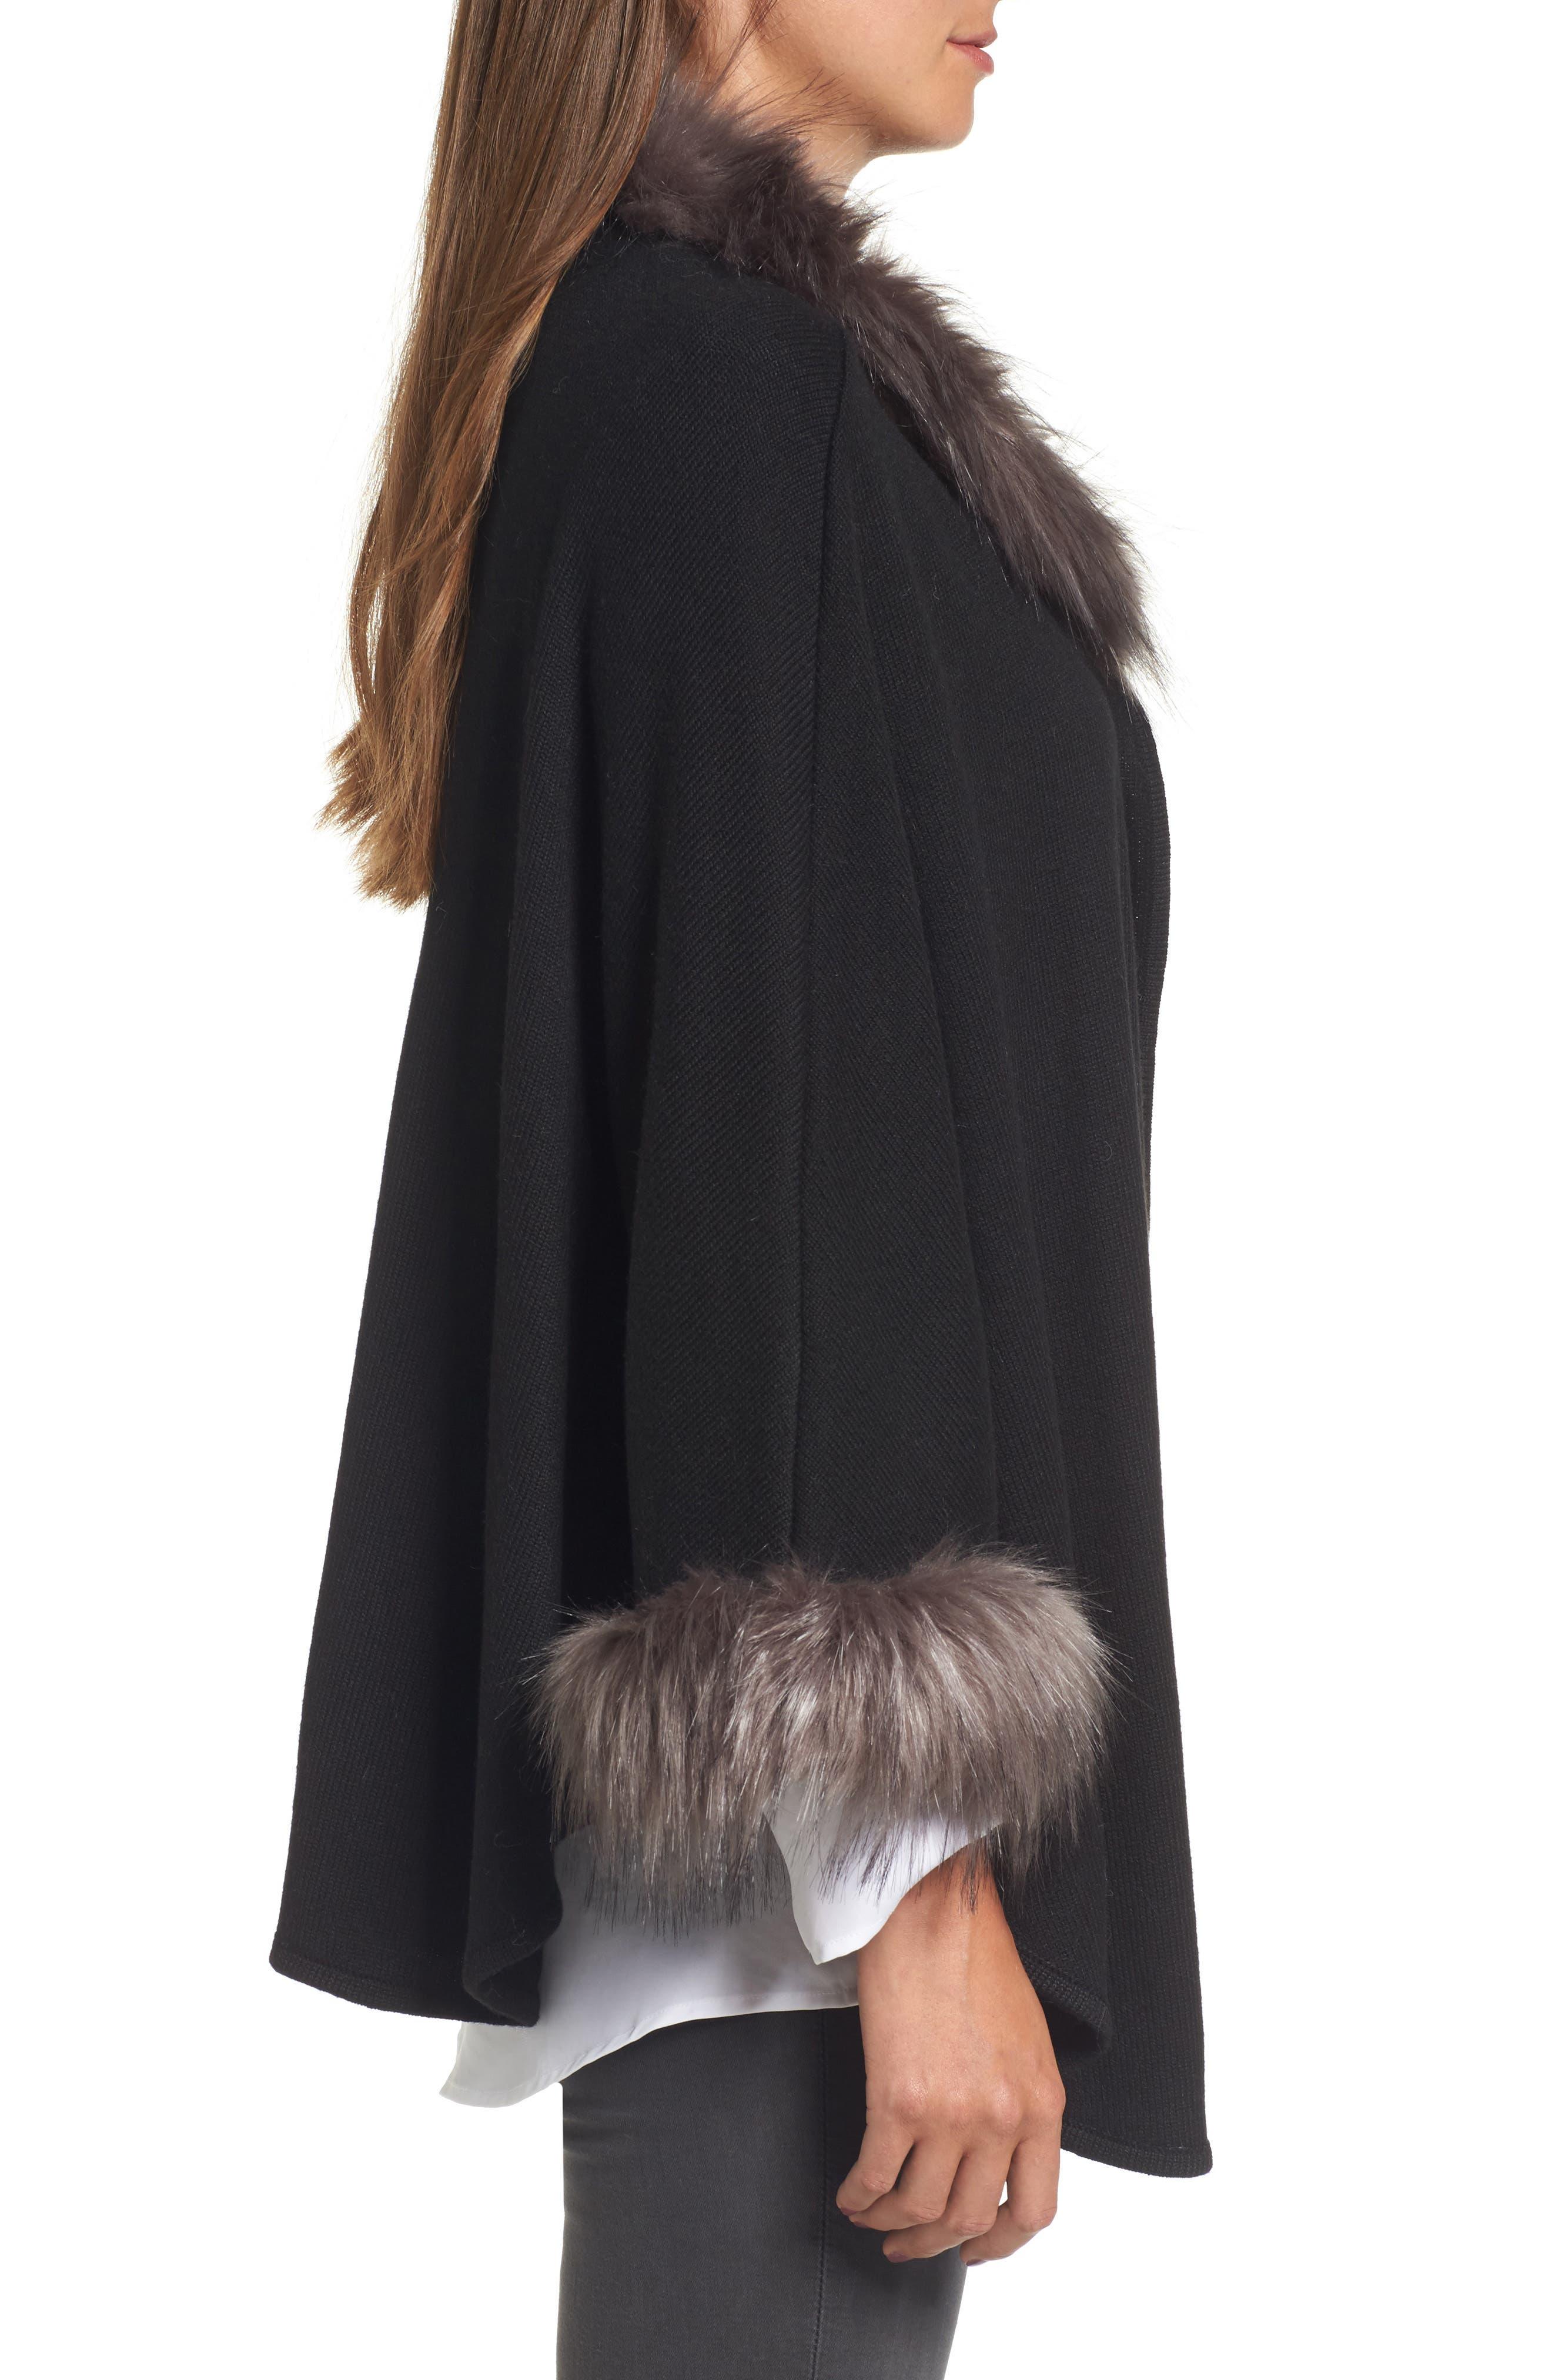 Knit Poncho with Faux Fur Trim,                             Alternate thumbnail 3, color,                             001